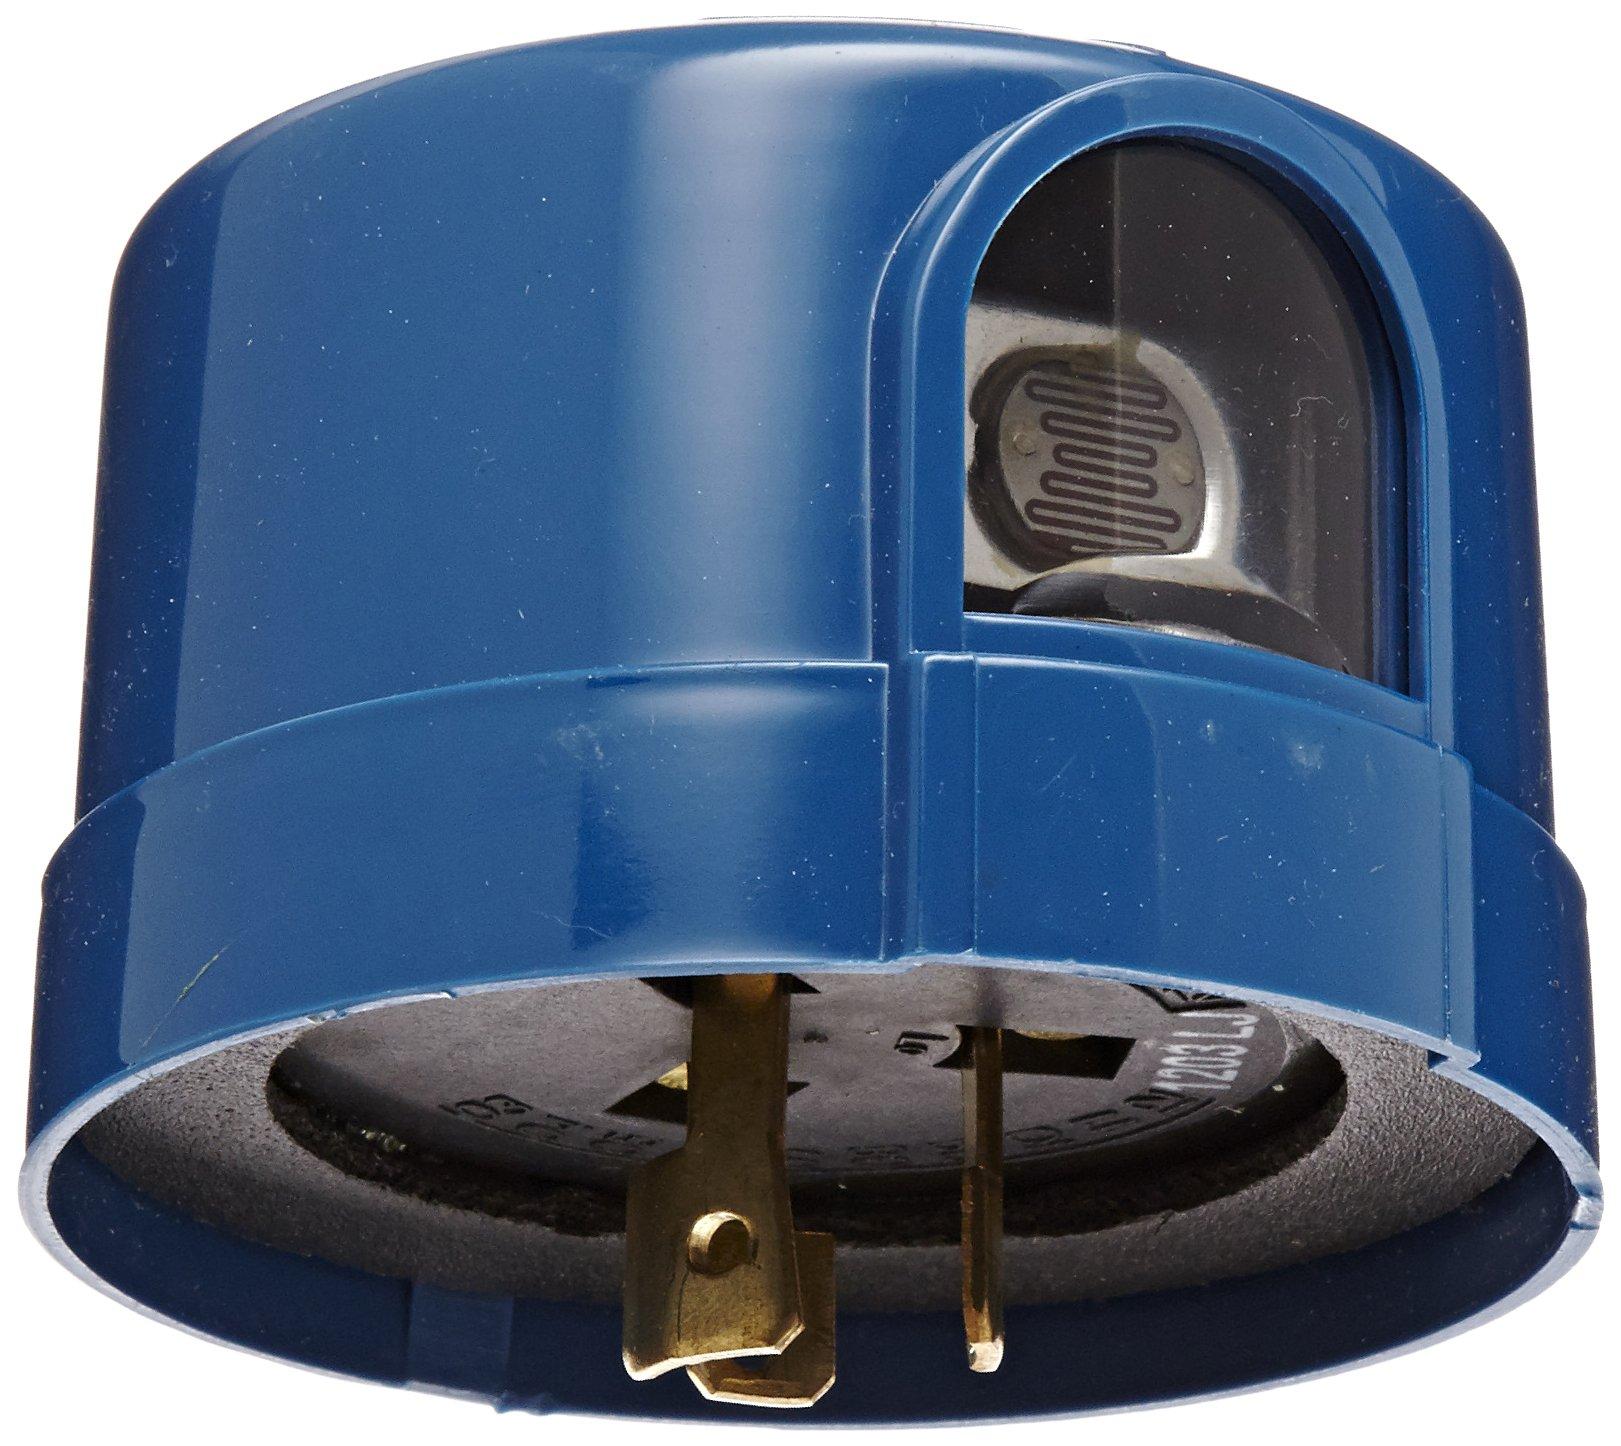 5000M Series Delayed Response Utility Grade Mov Surge Arrestor Photocontrol, 1800VA, 2080-2770VA Ballast, 1/2'' Light Sensor, 2000W Power, 105-130/208-285VAC Voltage, Blue (Note: This item is not designed for use with LED lighting)